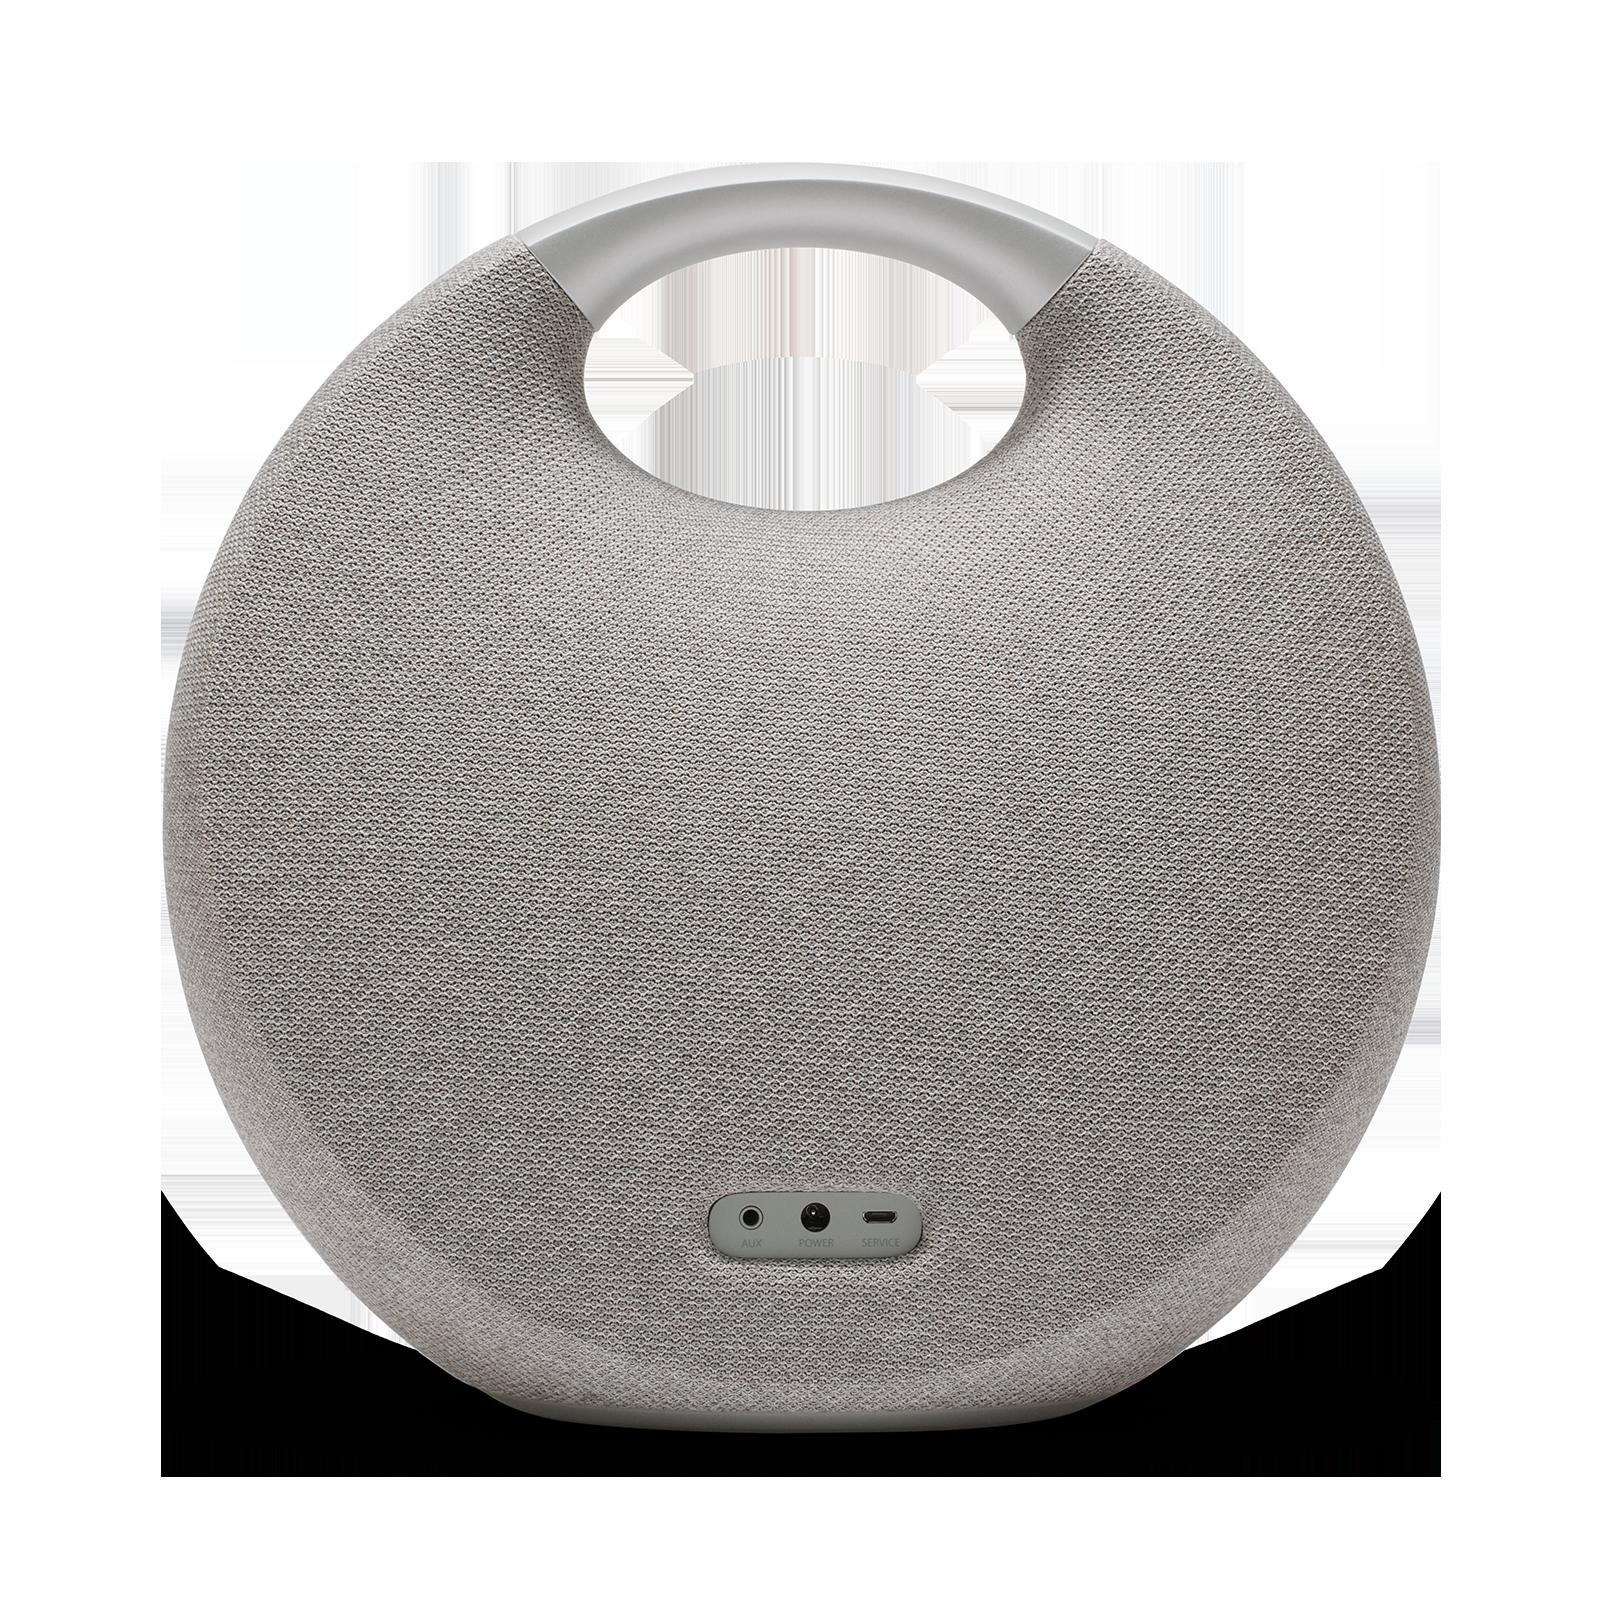 Onyx Studio 5 - Grey - Portable Bluetooth Speaker - Back